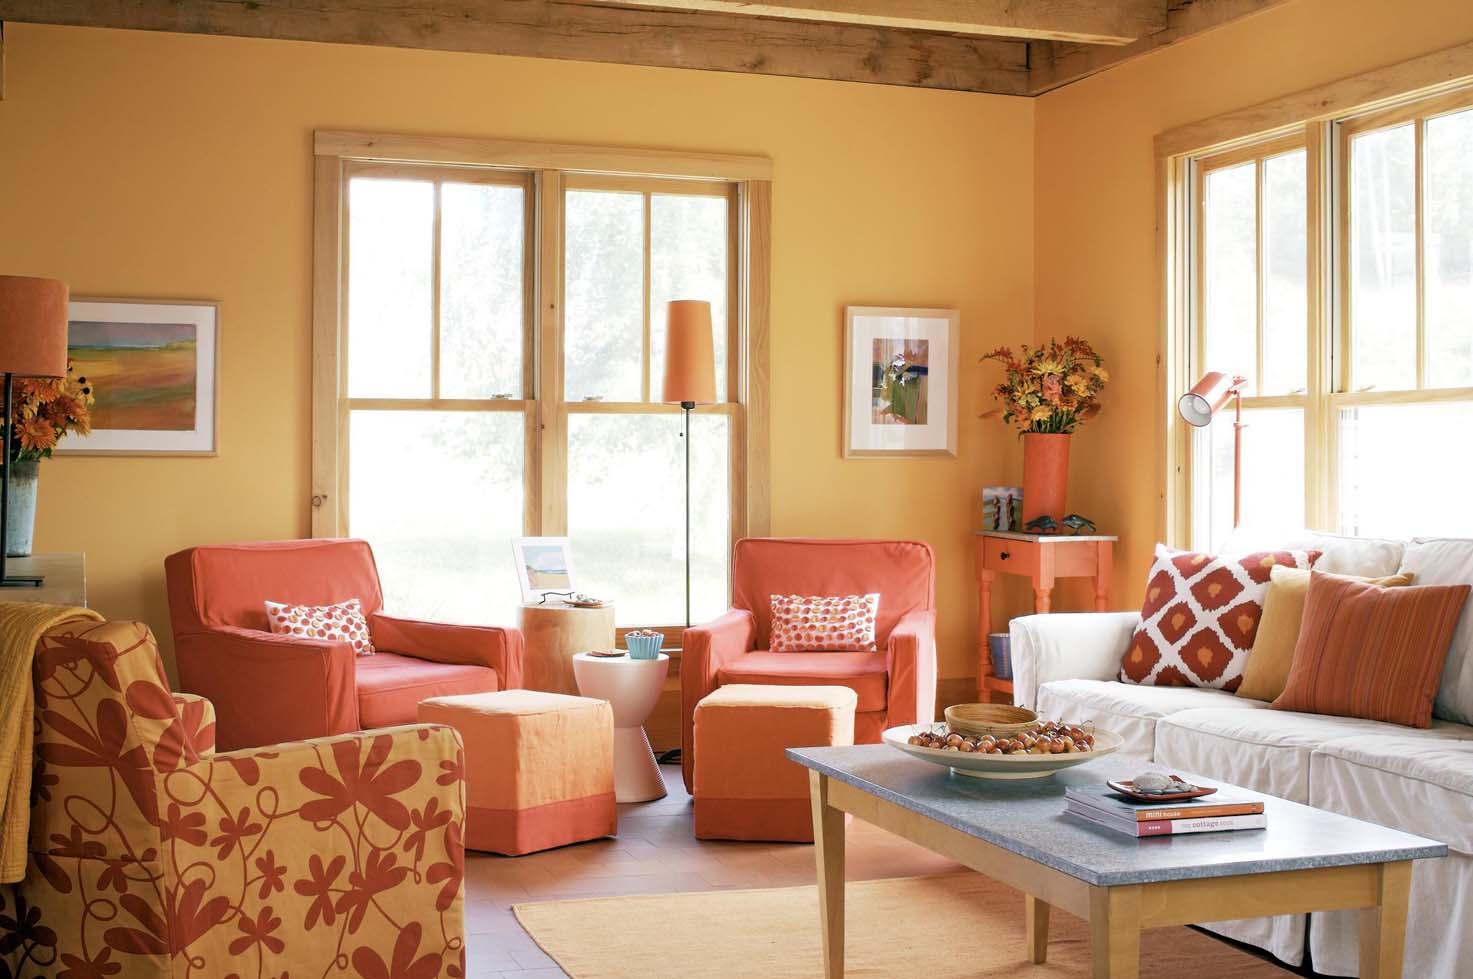 10 Salas color Naranja  Salas con estilo